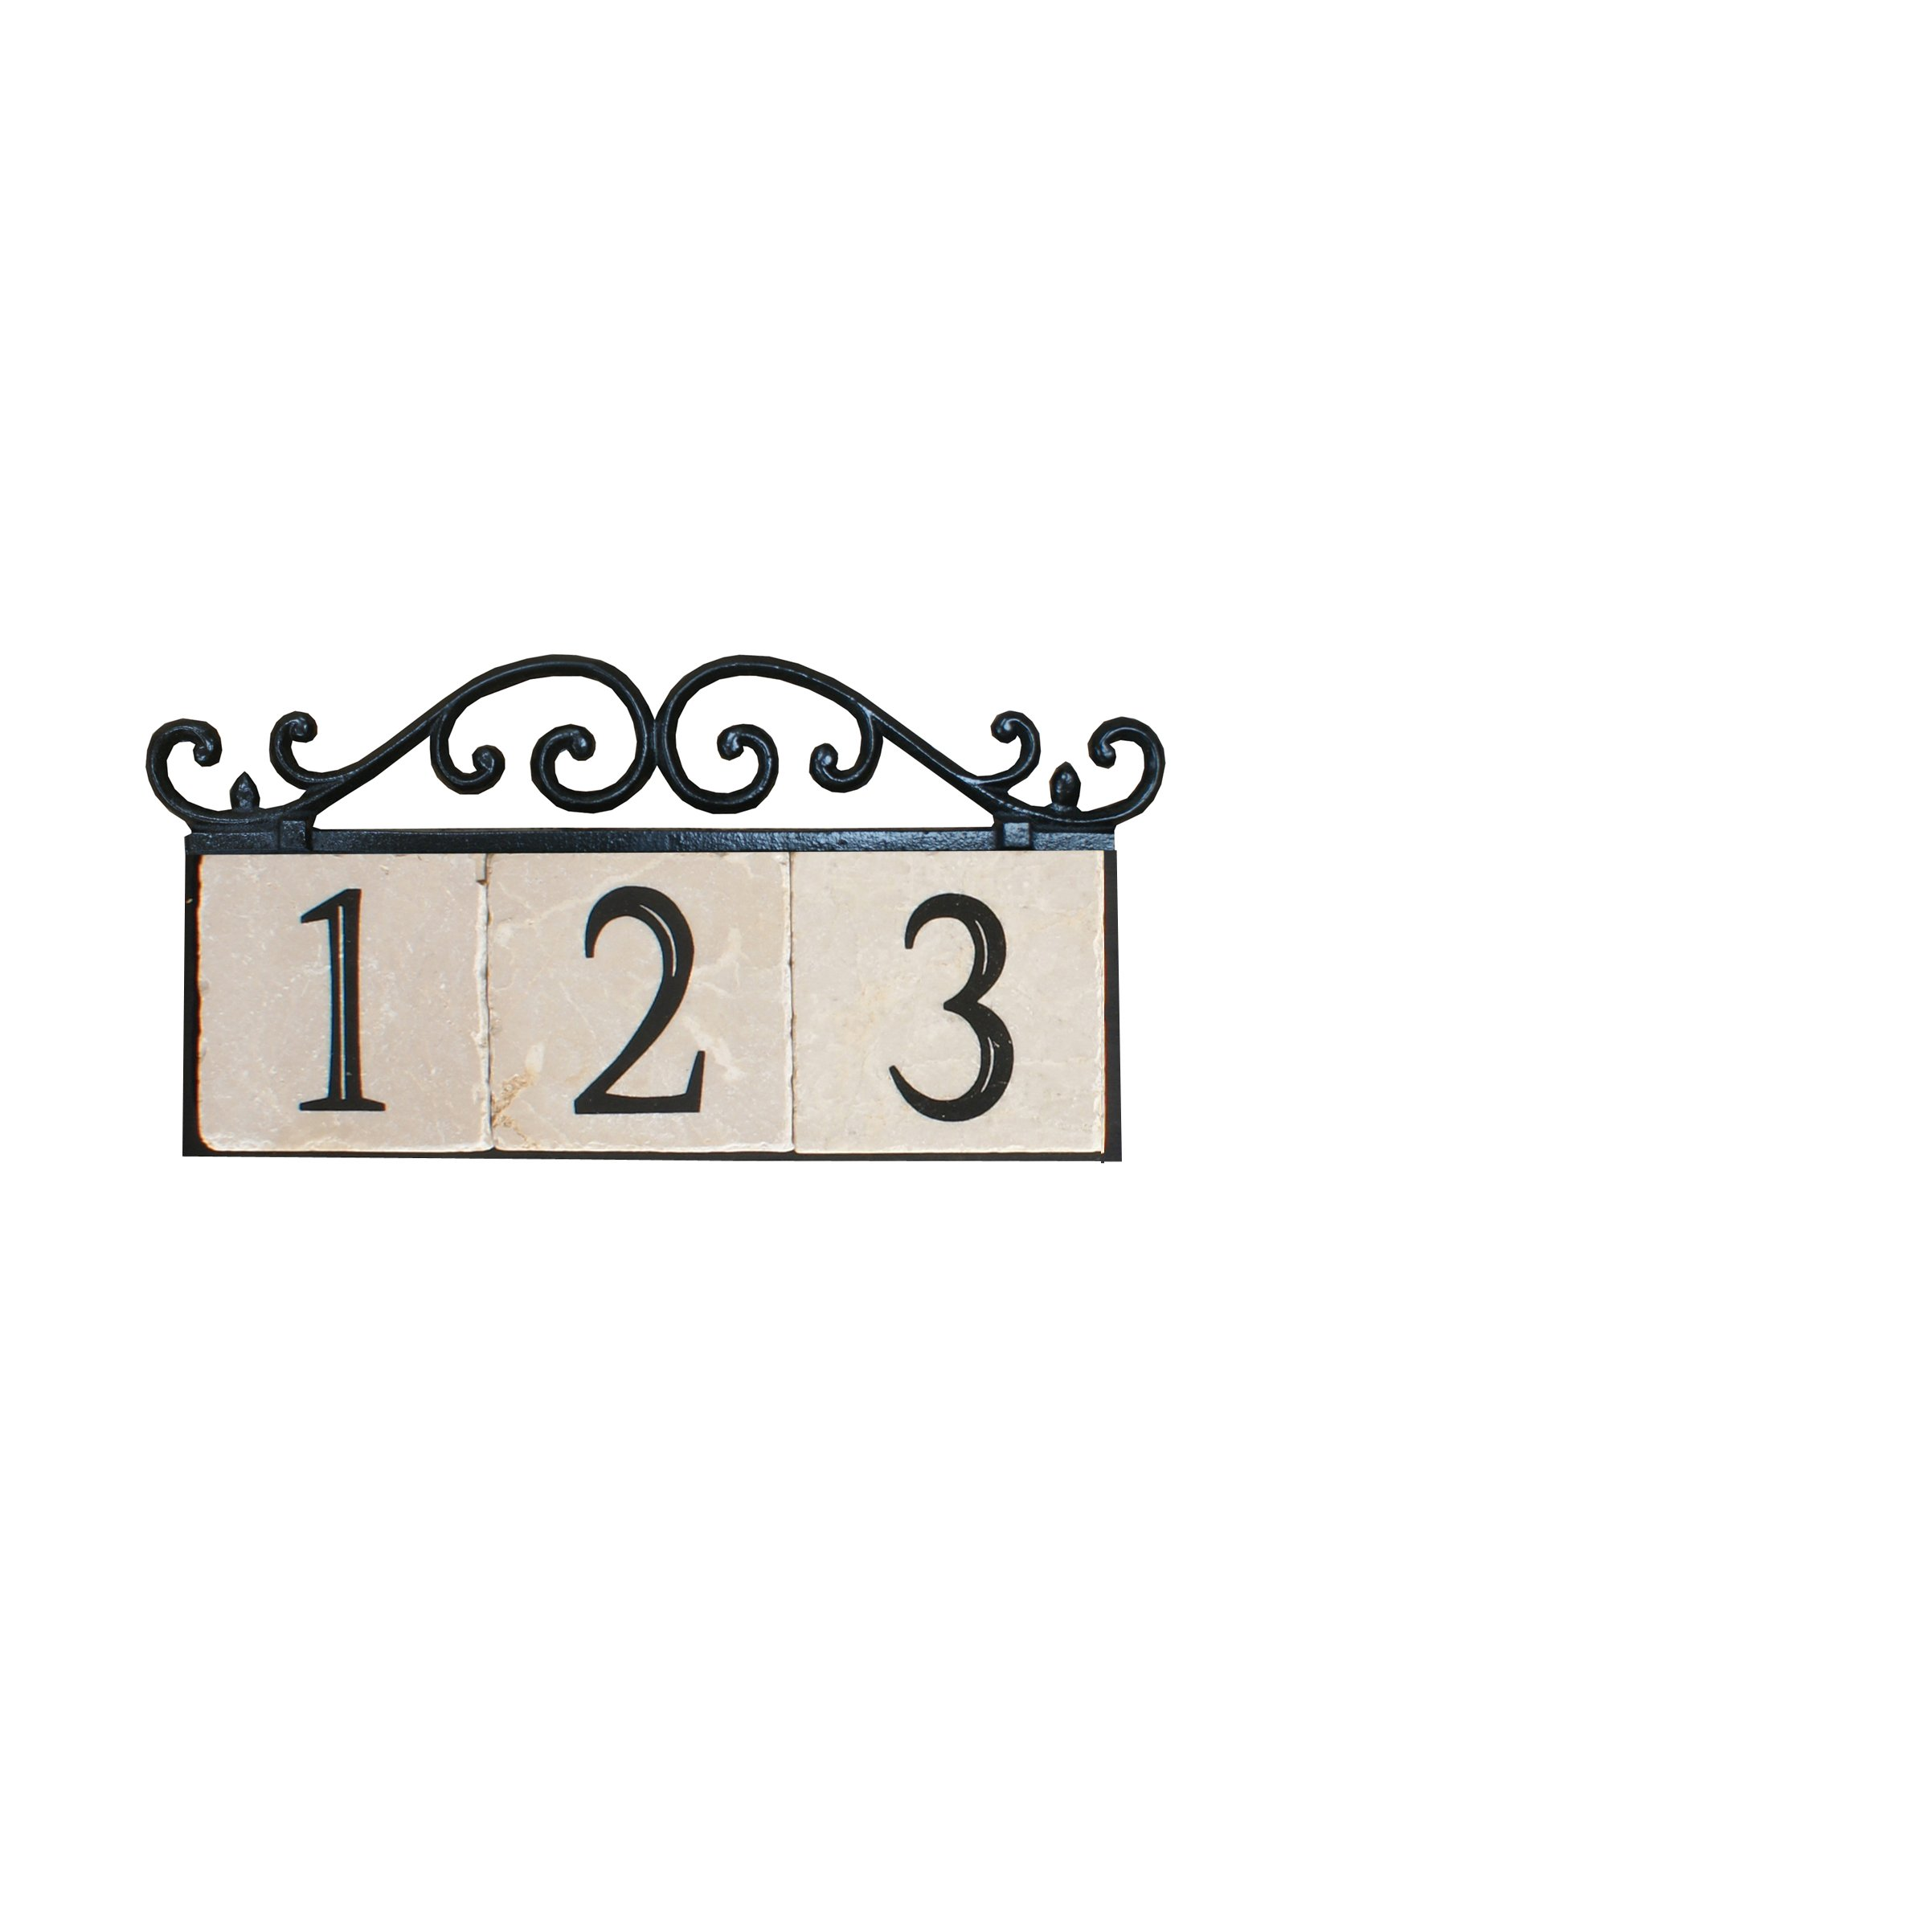 NACH KA House Address Sign/Plaque - Old World, 3 Numbers, Iron, 13 x 8 x 1''